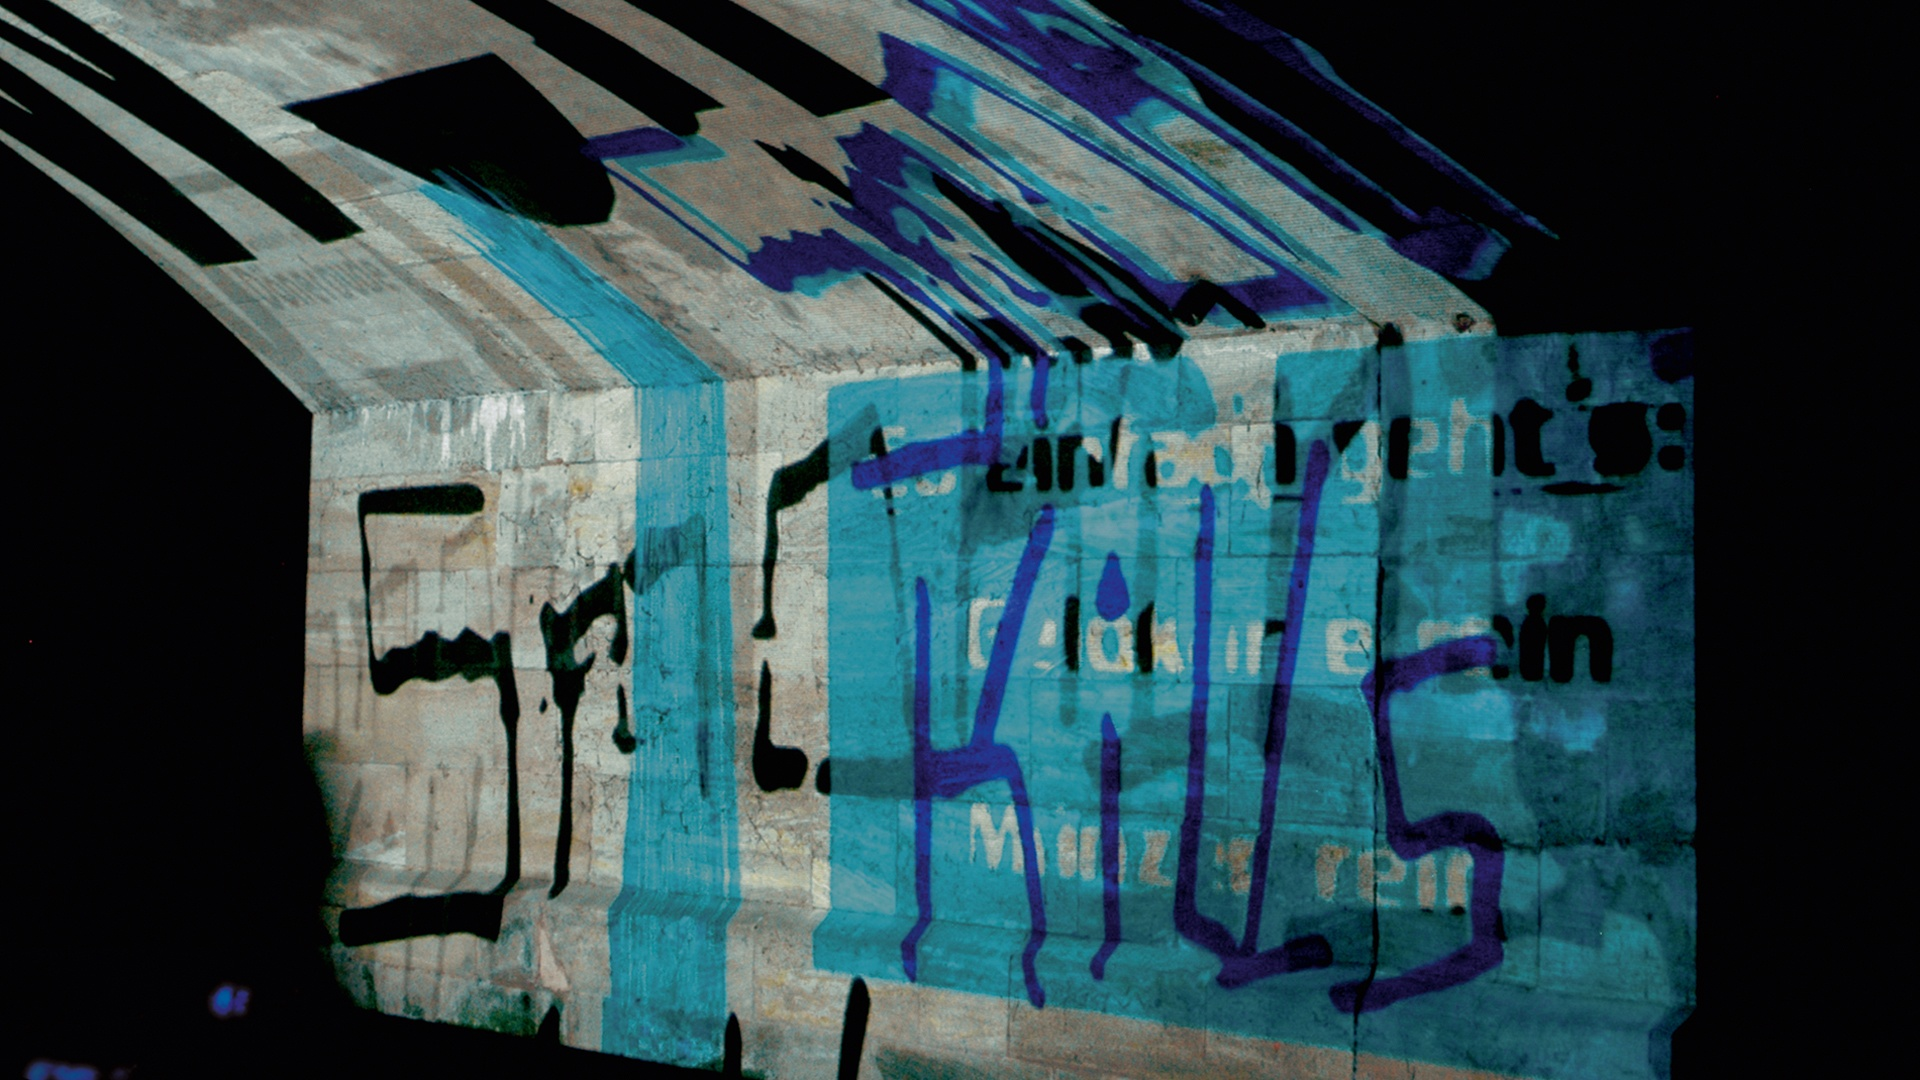 Projektion Blaue Nacht